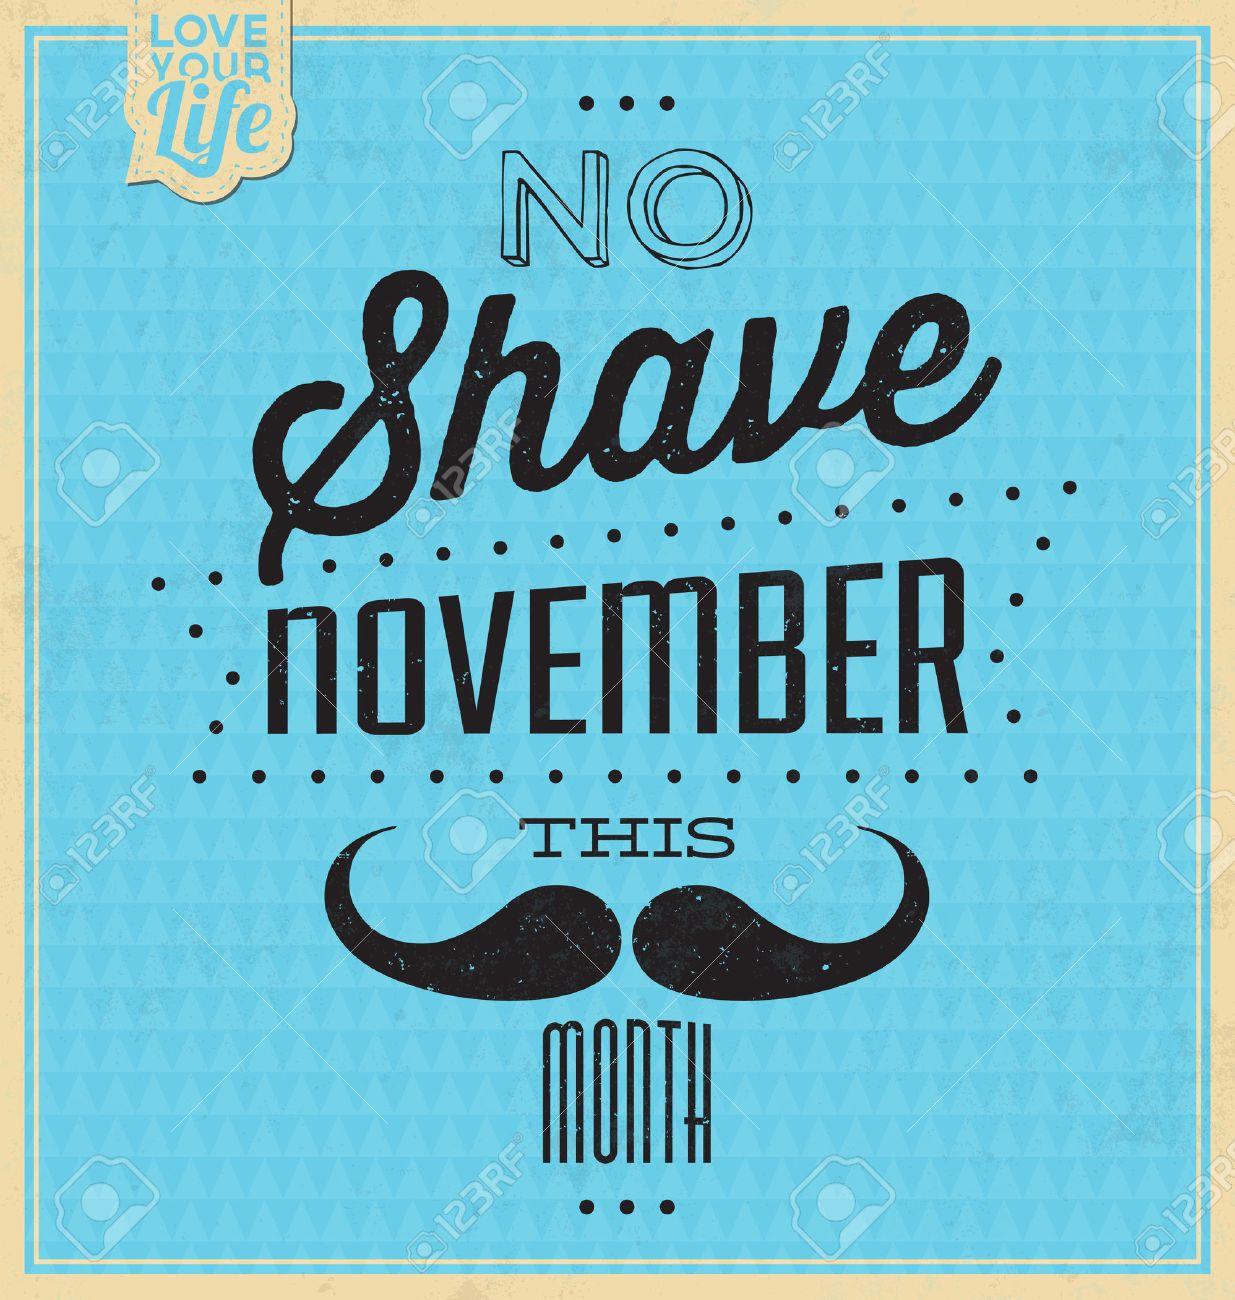 Vintage Template - Retro Design - Quote Typographic Background - No Shave November Stock Vector - 23651950